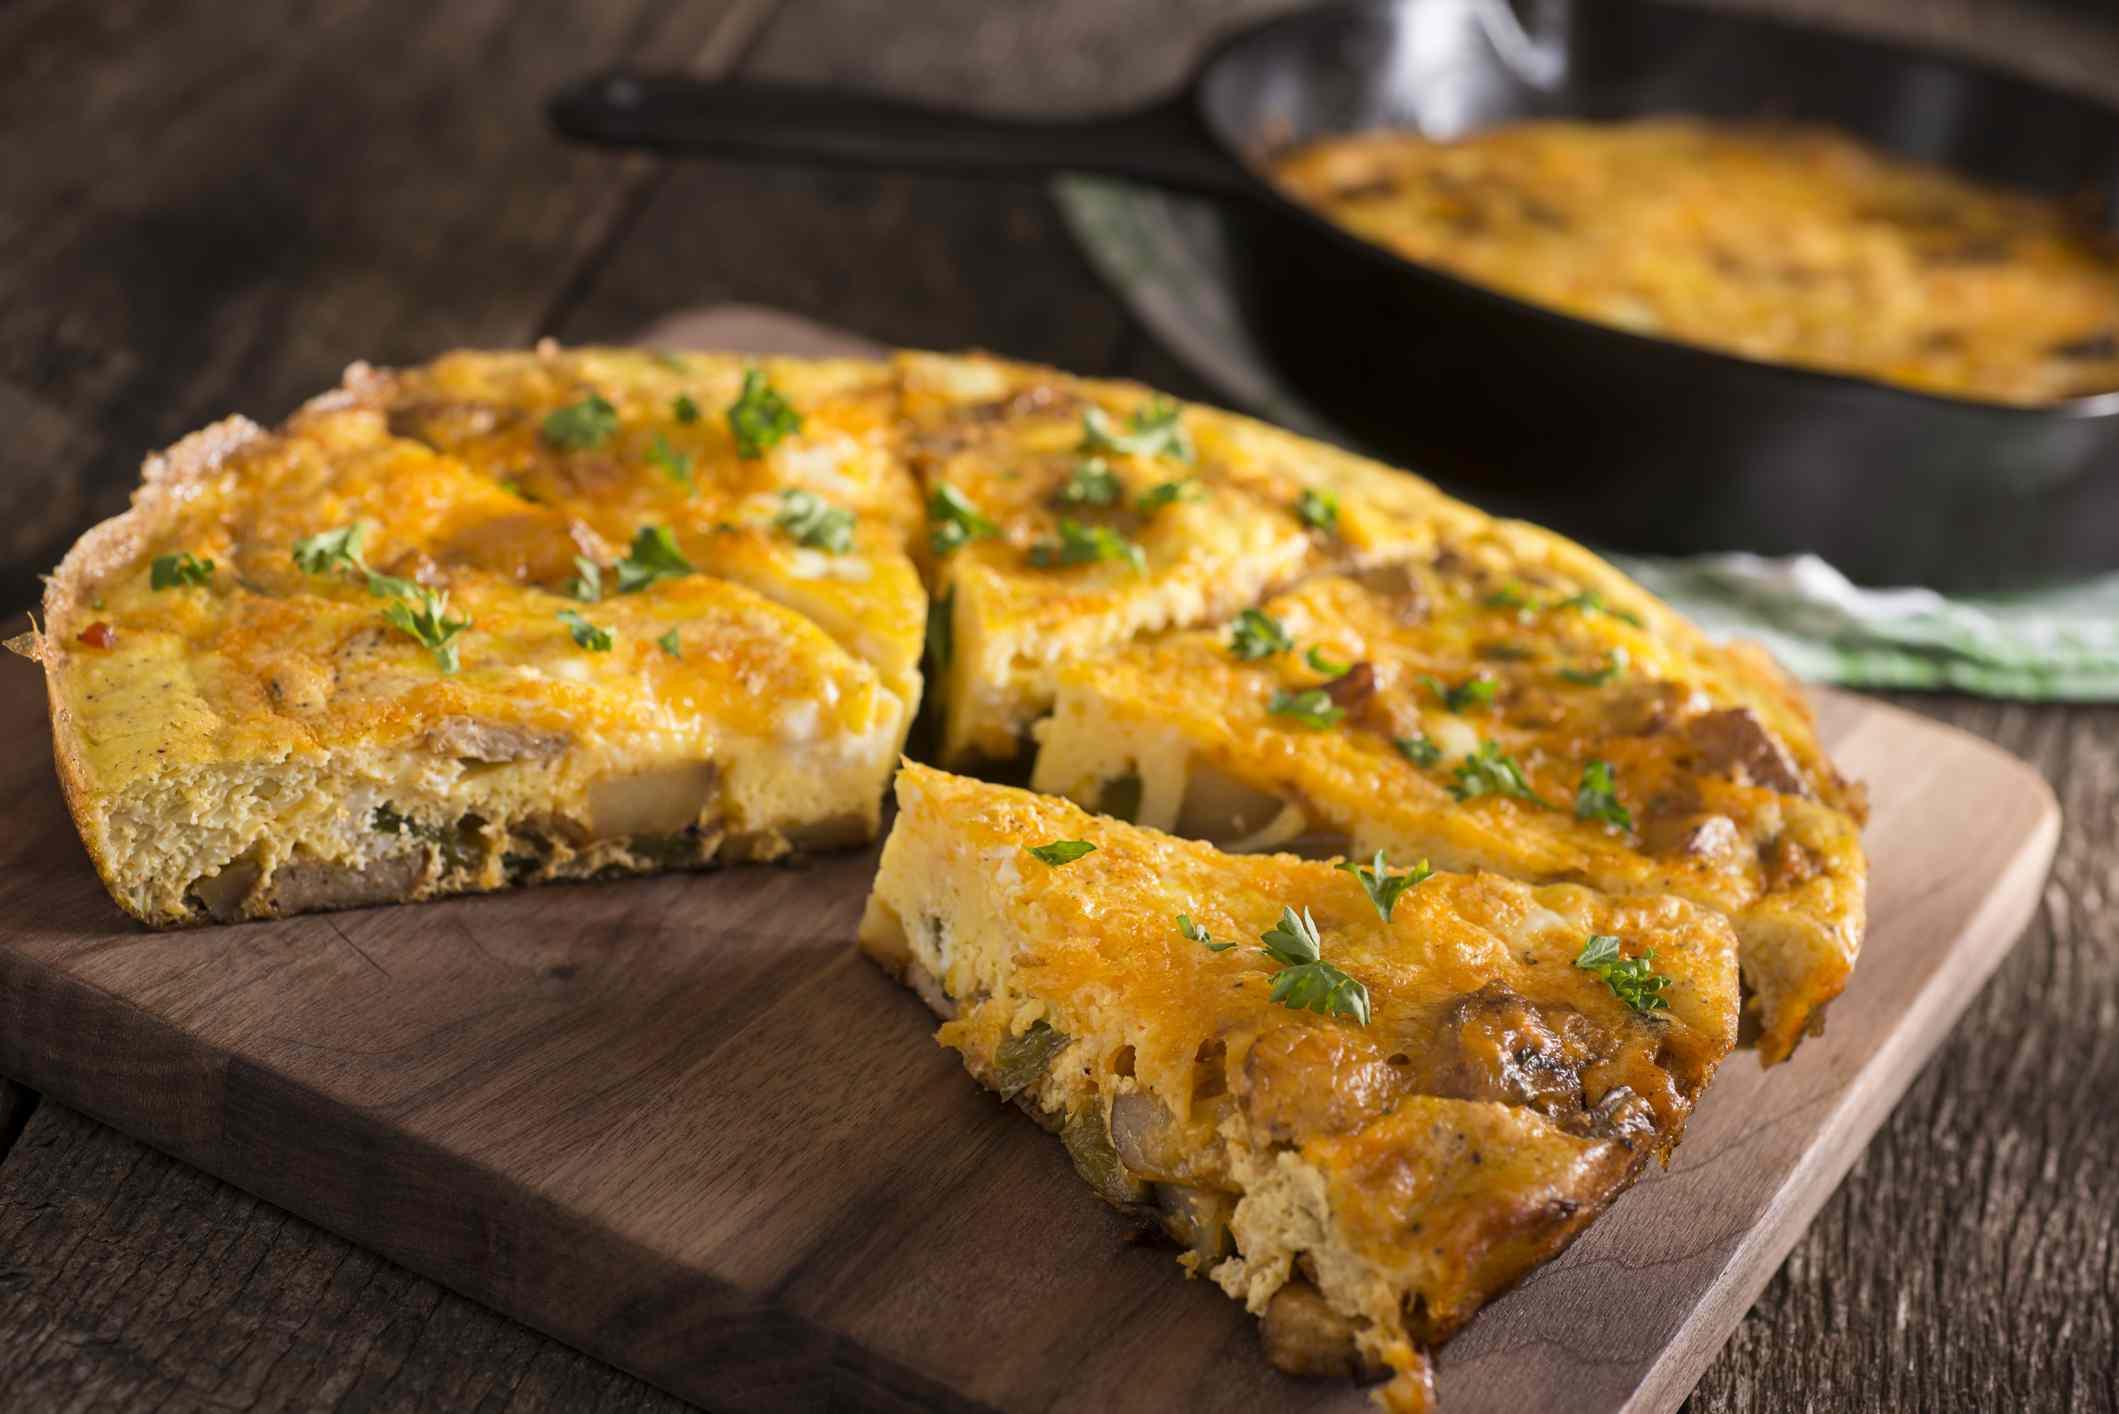 Cheese quiche slices